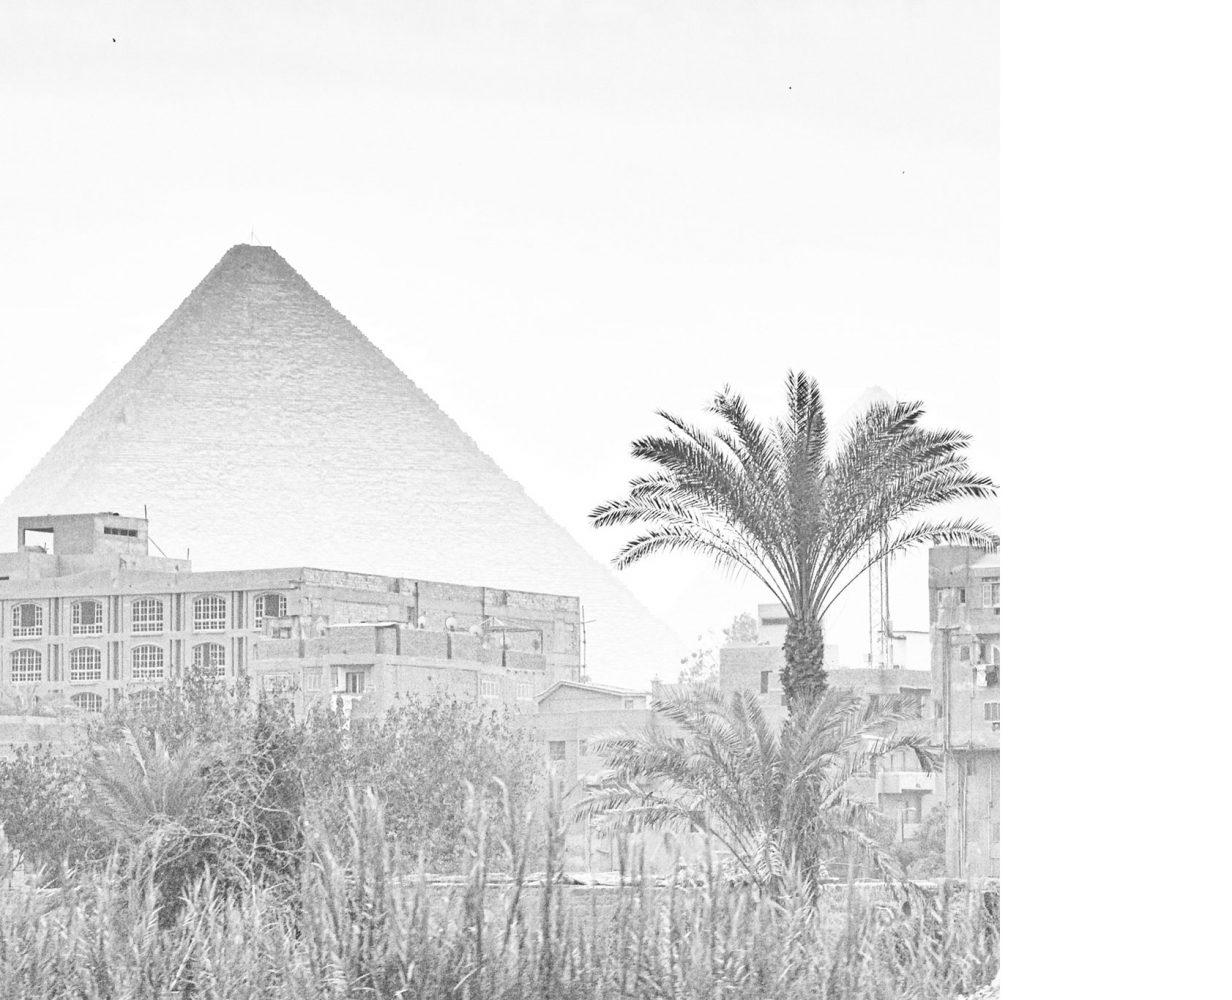 egypt_b&w_thevoyageur24